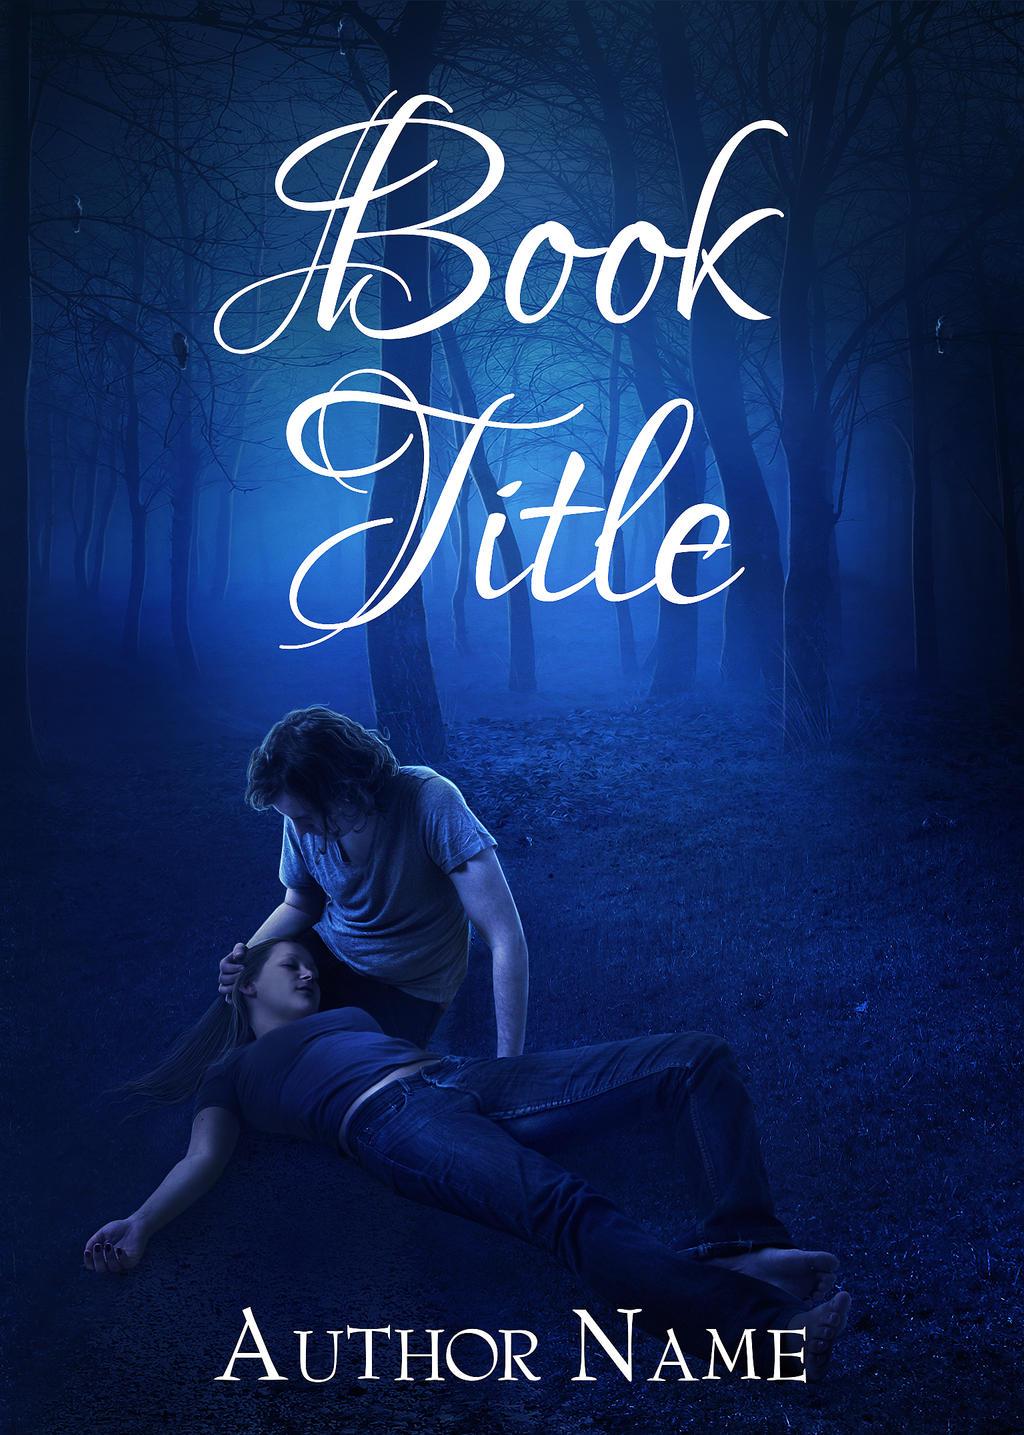 Premade Book Cover Art : Premade book cover by morteque on deviantart